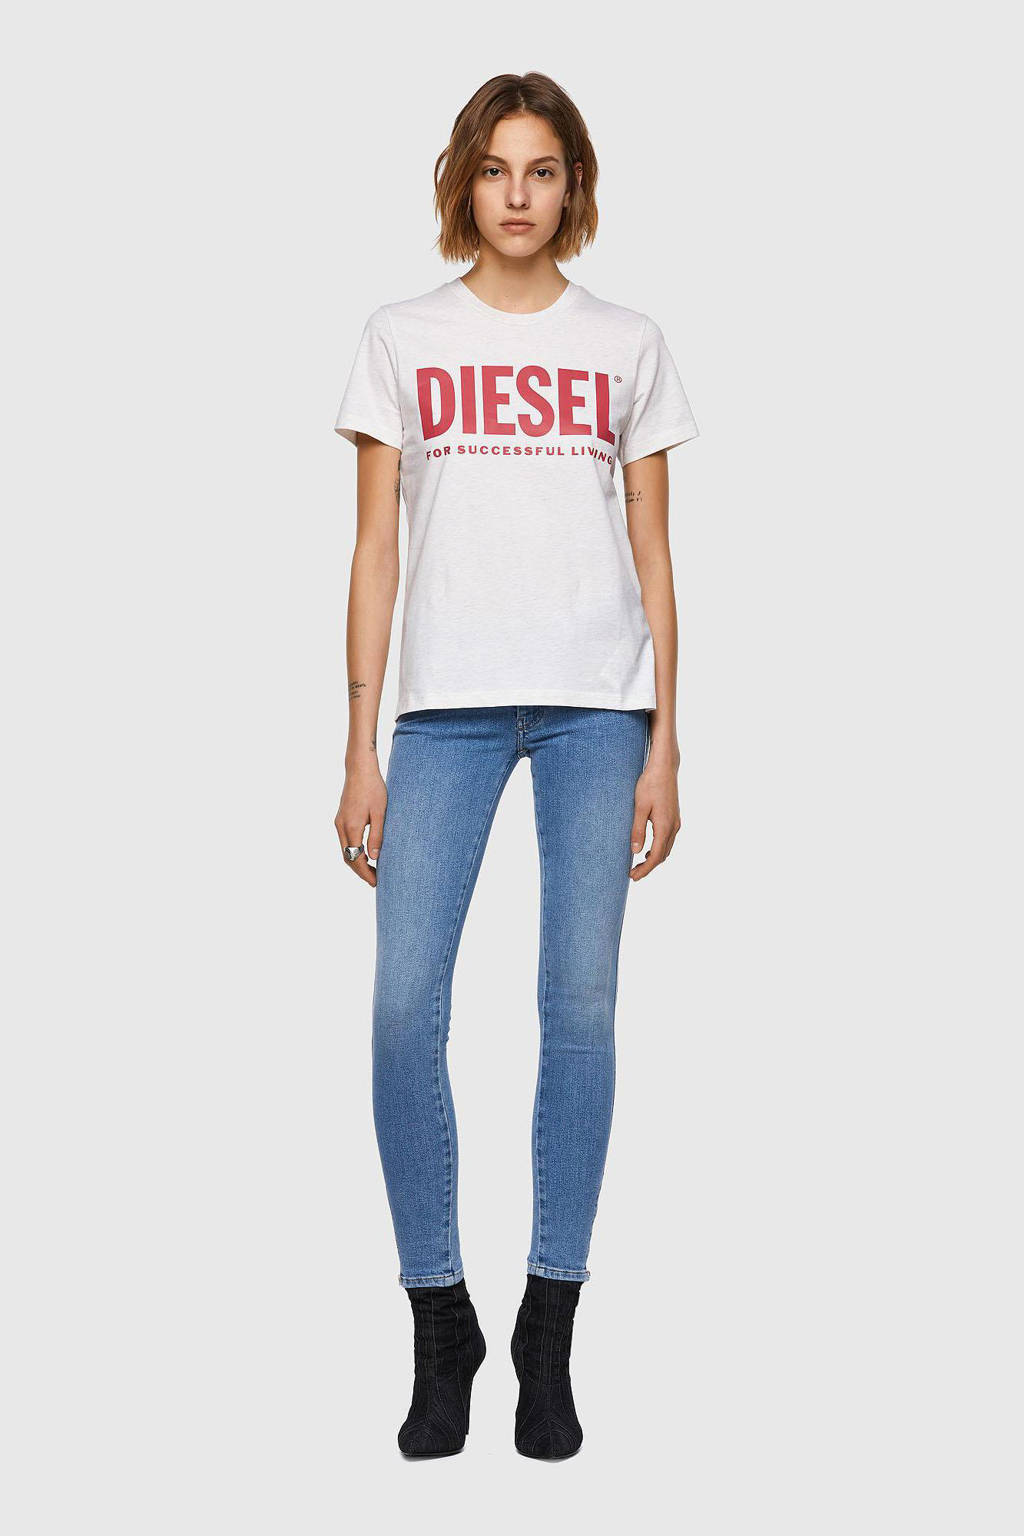 Diesel T-shirt T-SILY-ECOLOGO T-SHI met logo wit, Wit